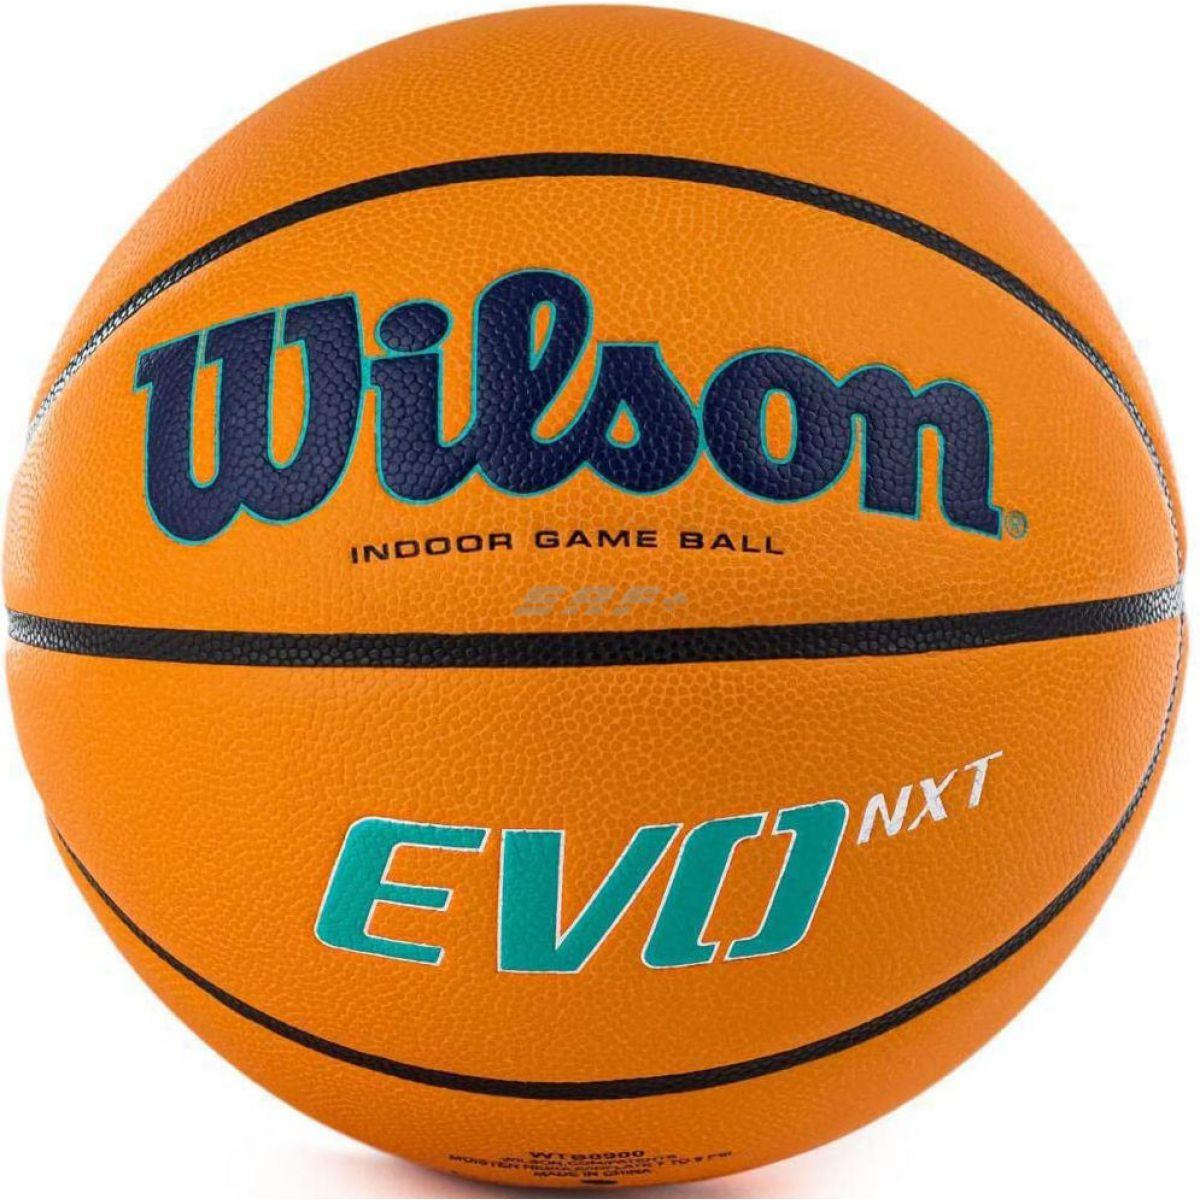 Мяч баск. WILSON EVO NXT CHAMPIONSLEAGUE, арт.WTB0900XBBCL, р.7, FIBA Appr, микрофибра, оранжевый